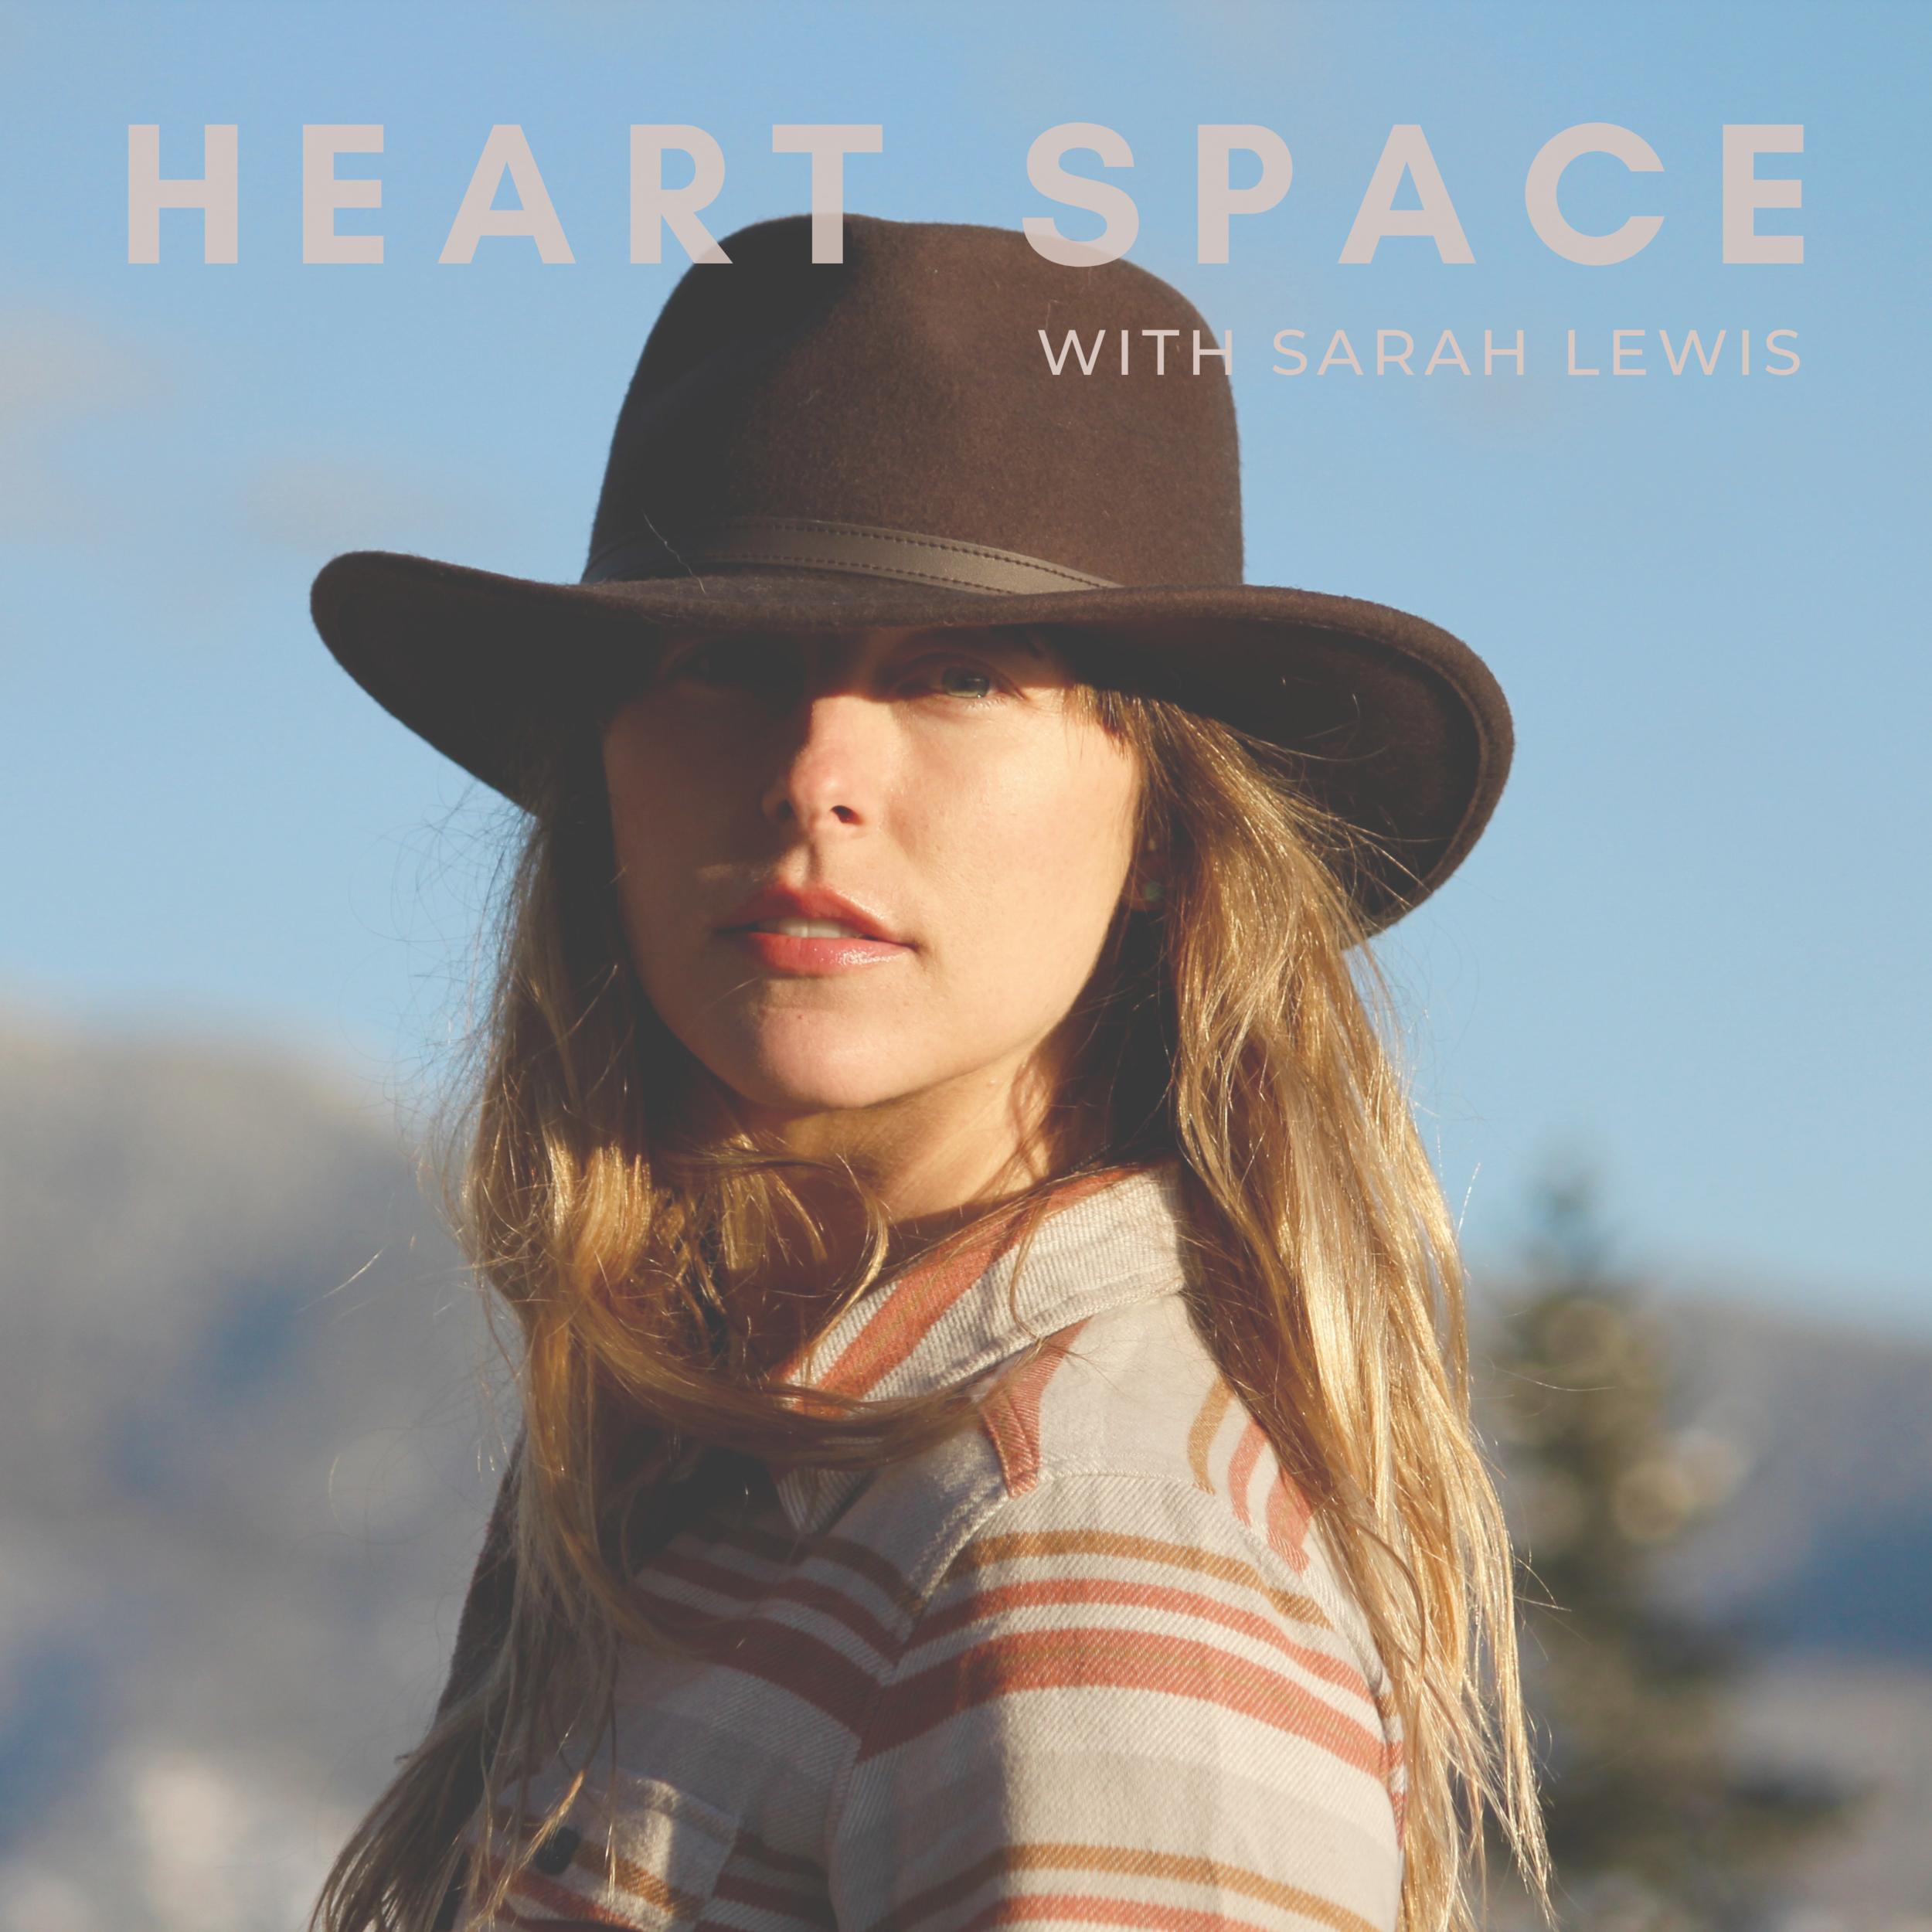 sarah-lewis-heart-space-susan-hunt-live-lightly.png